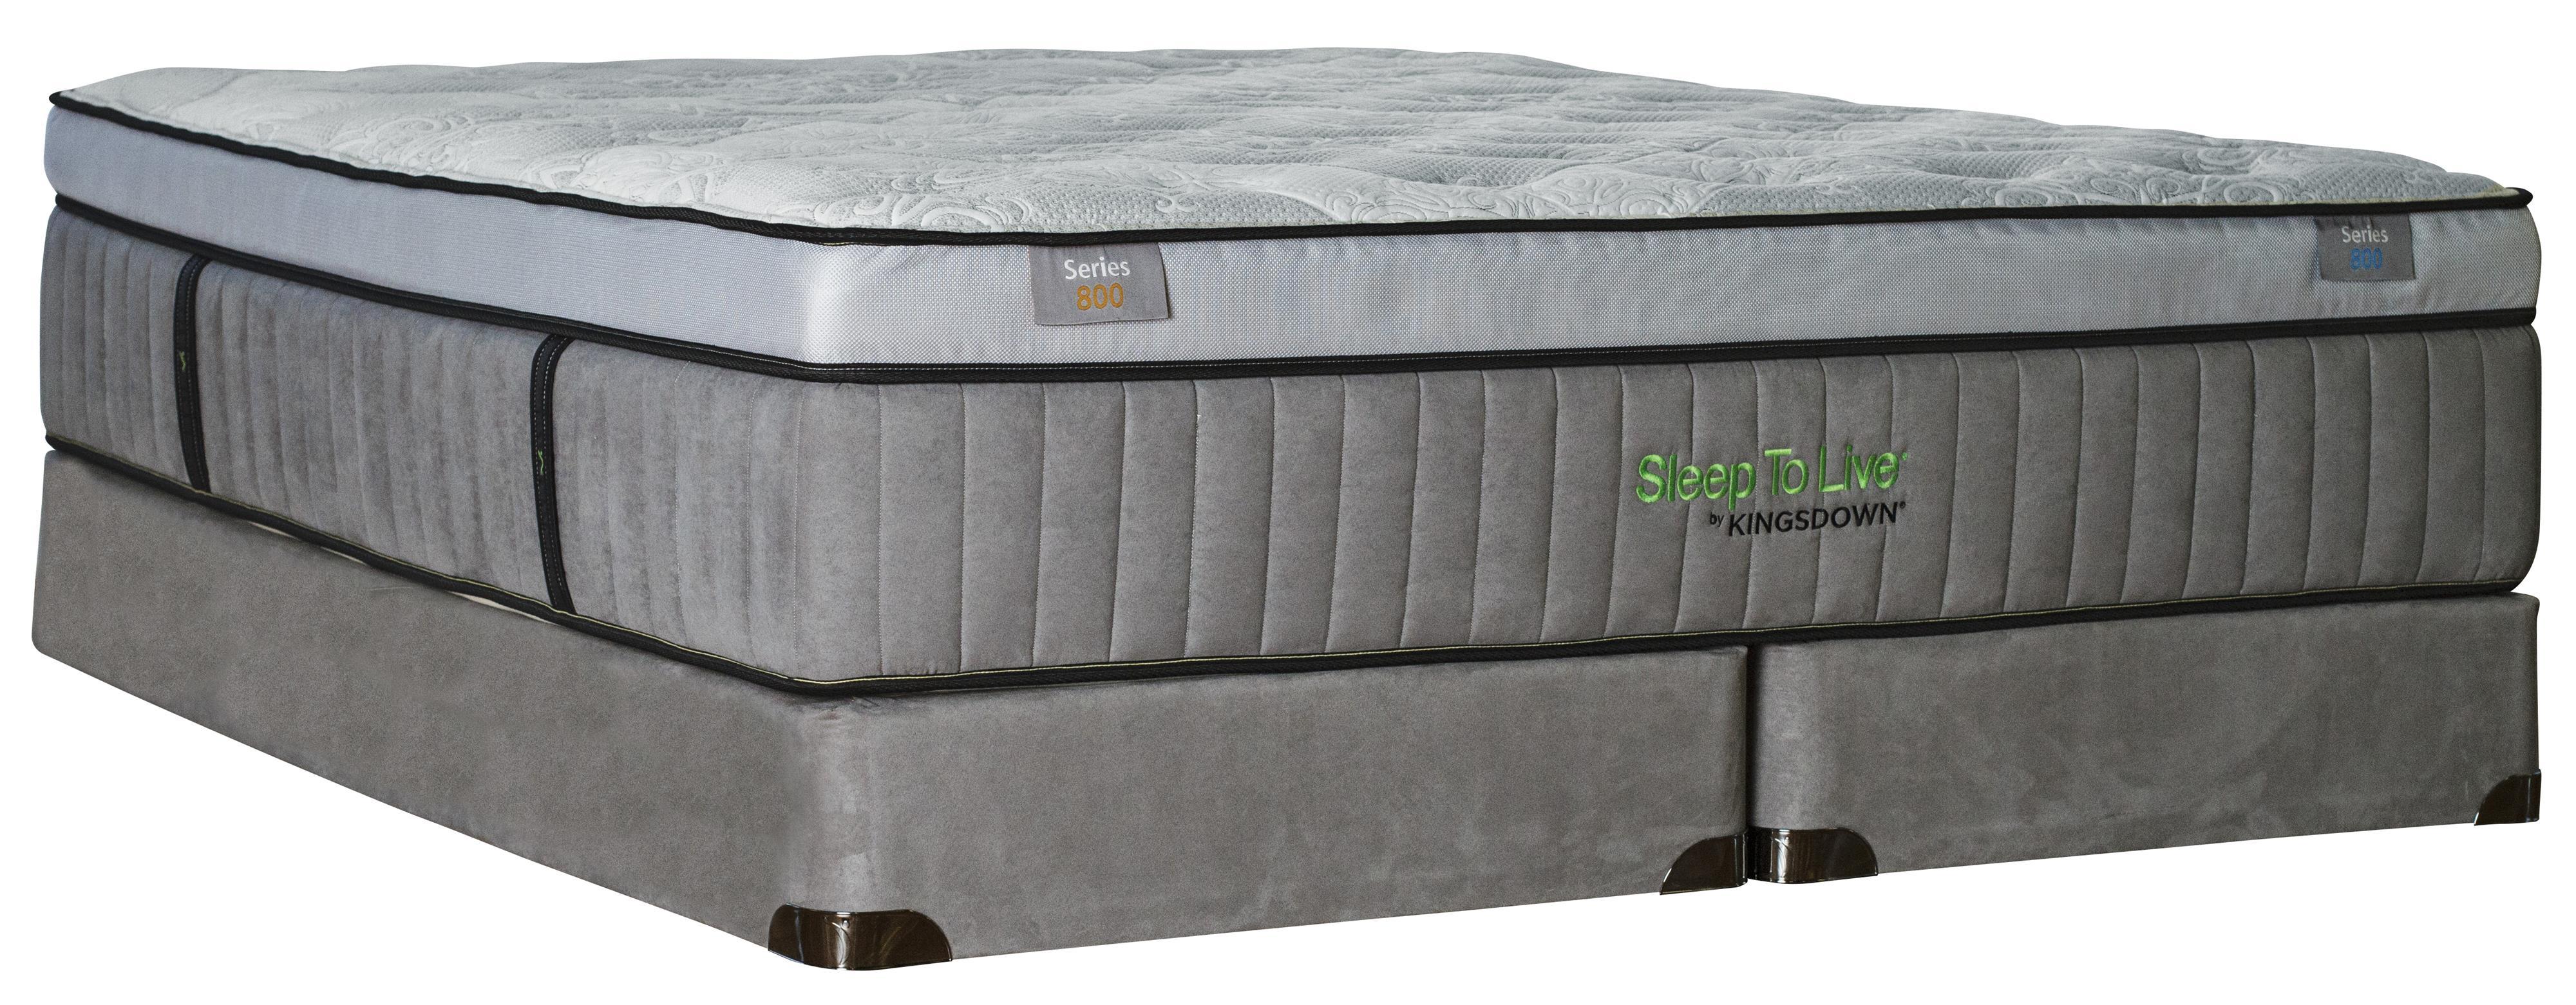 Kingsdown Sleep to Live 800 Full Luxurios Box Top Mattress Set - Item Number: Series800-F+1128SFH-F